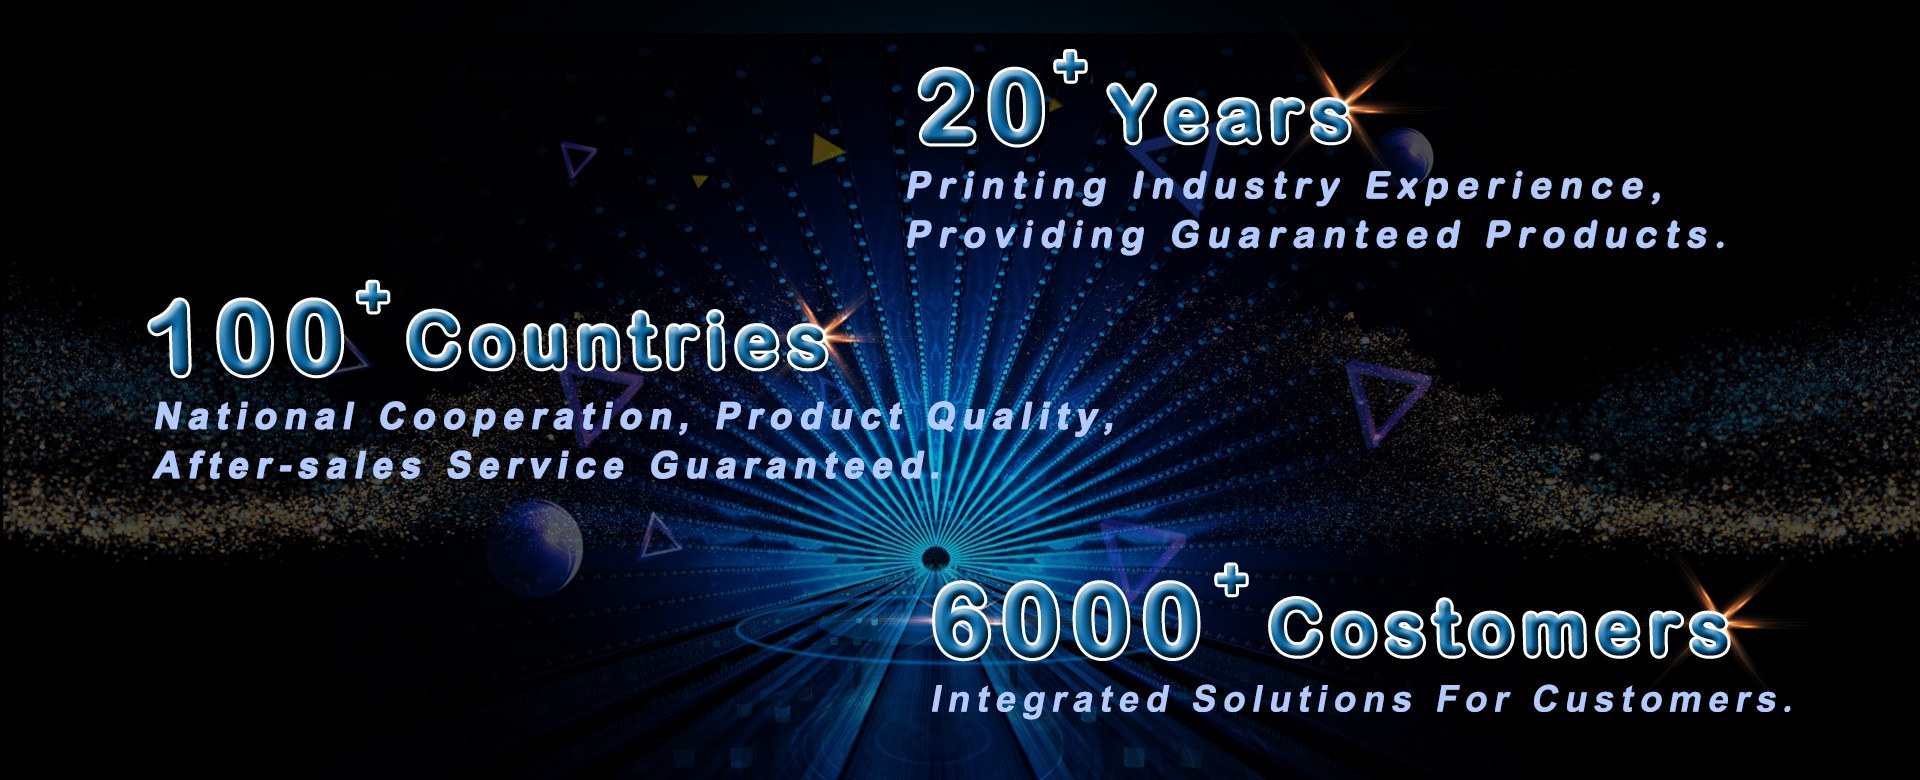 Guangzhou Print Area Technology Co., Ltd